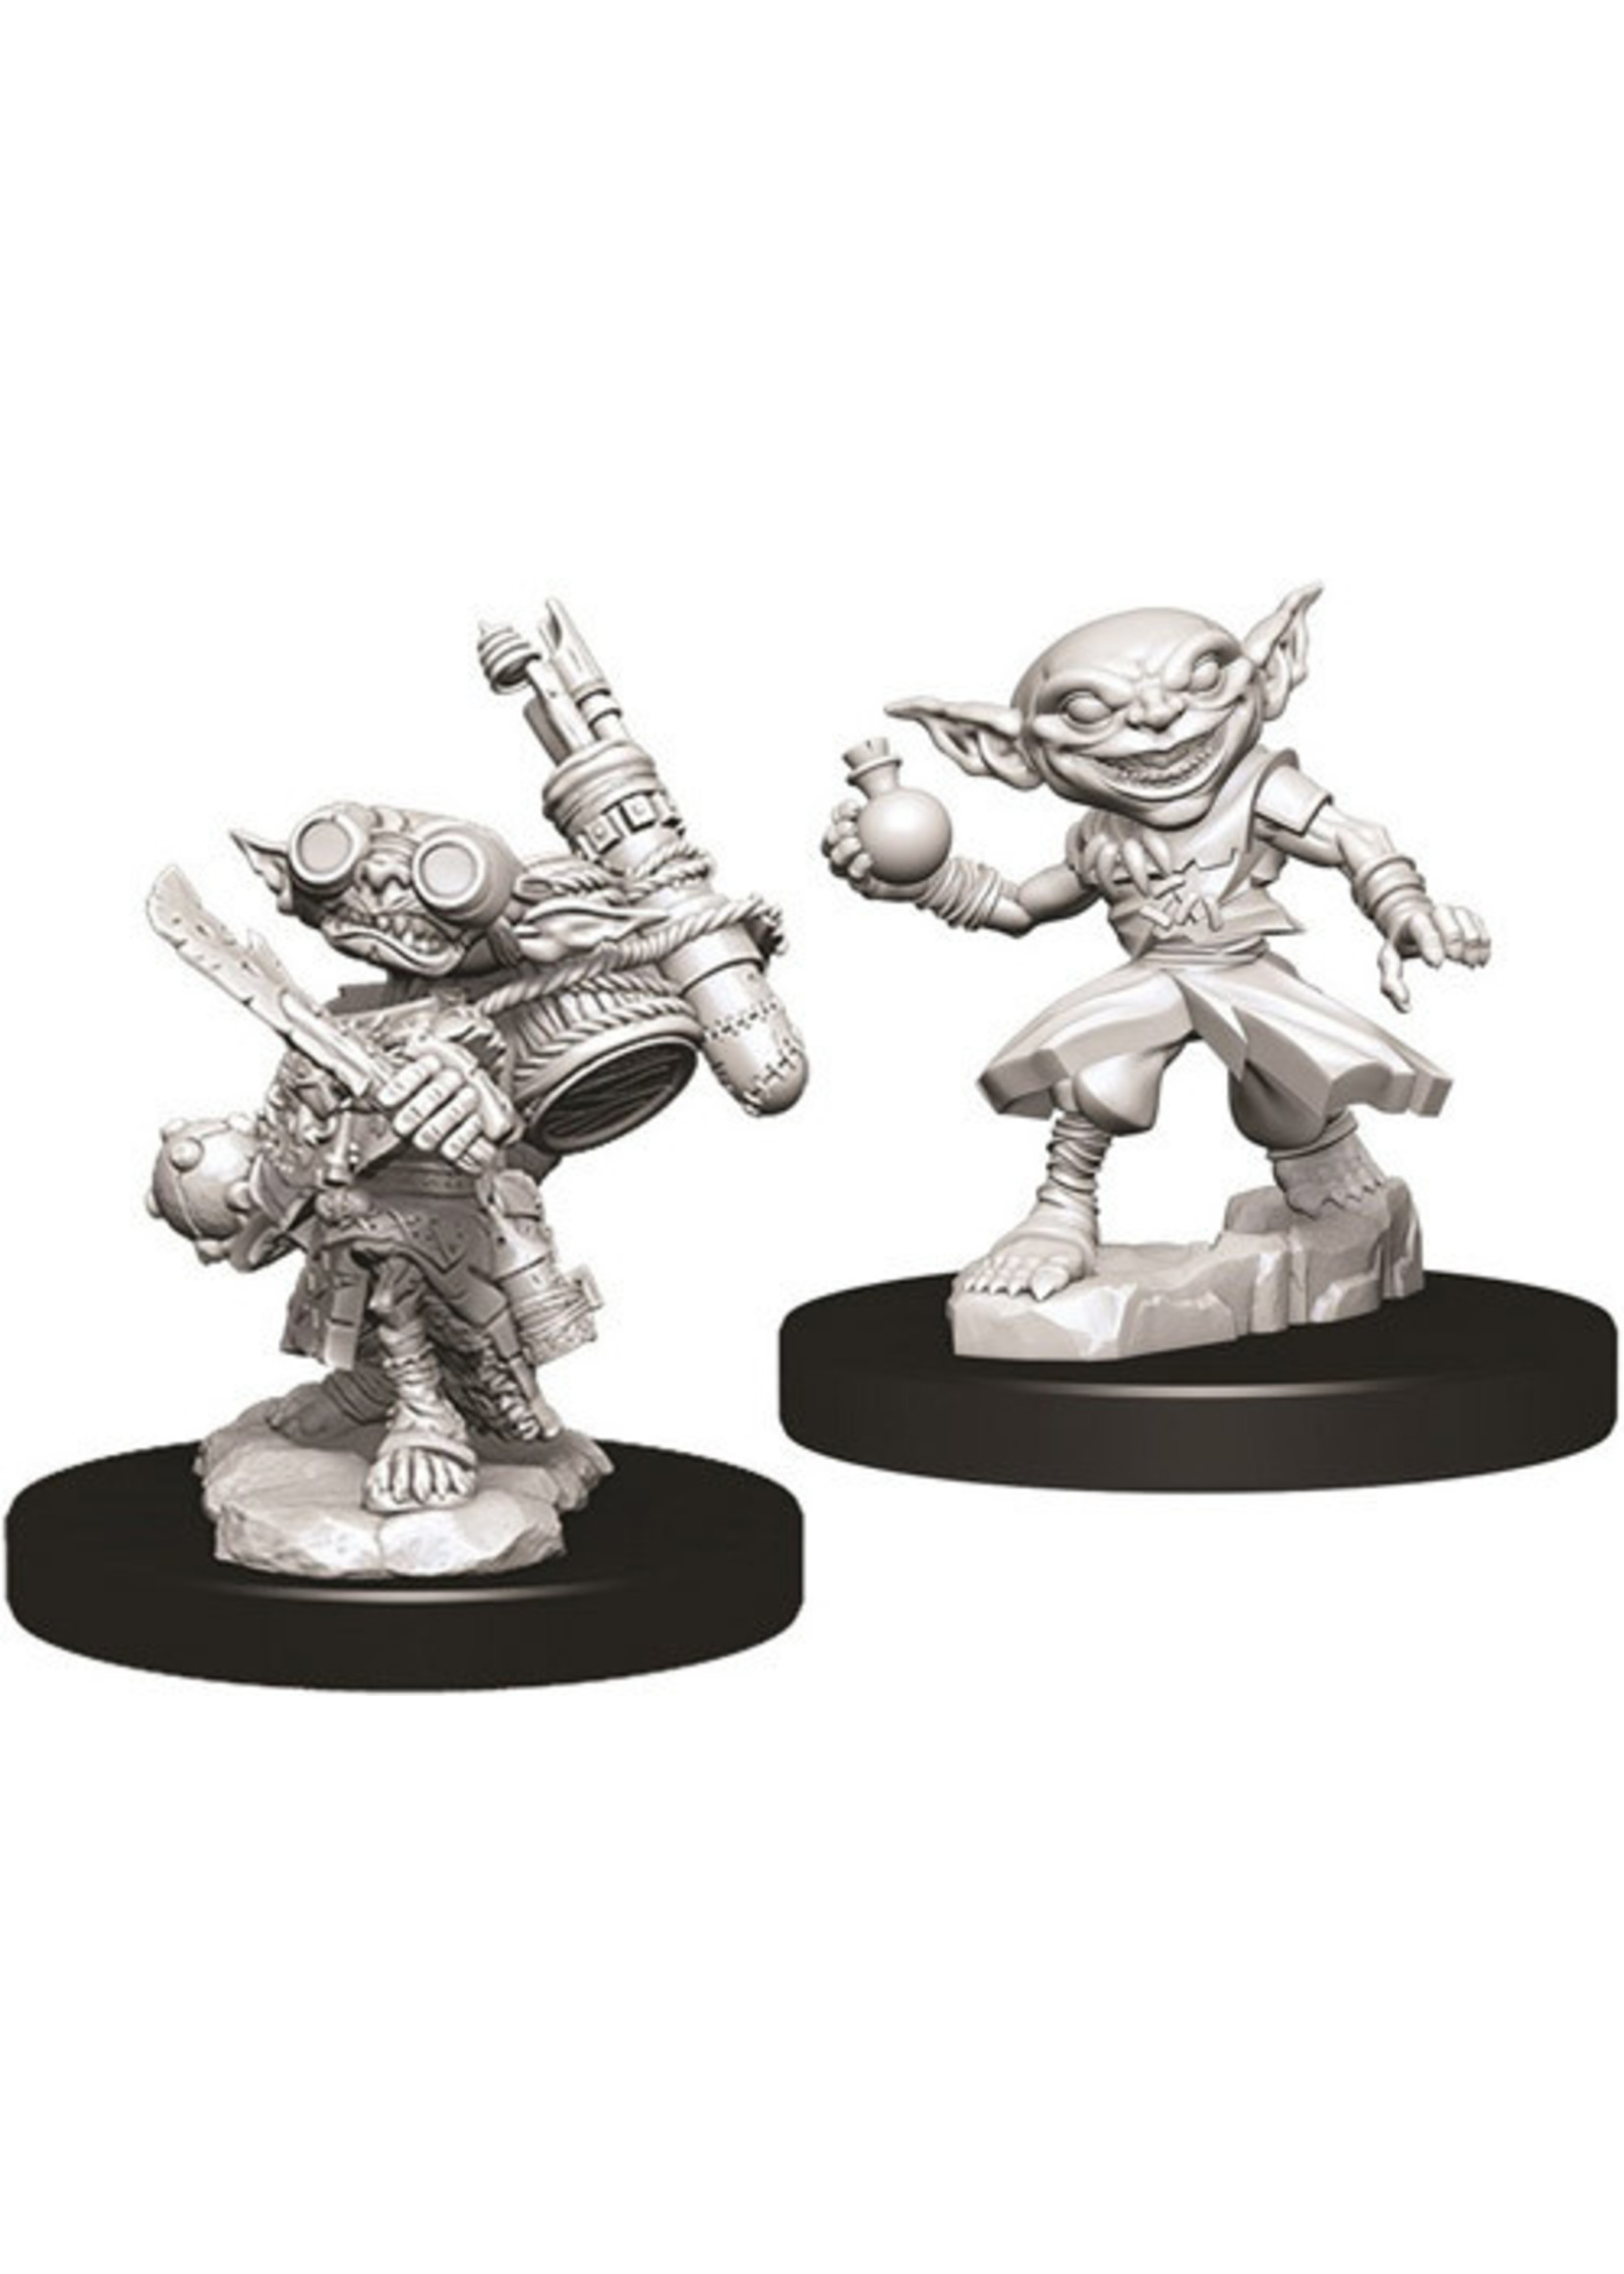 Pathfinder Deep Cuts Unpainted Miniatures: W9 Male Goblin Alchemist